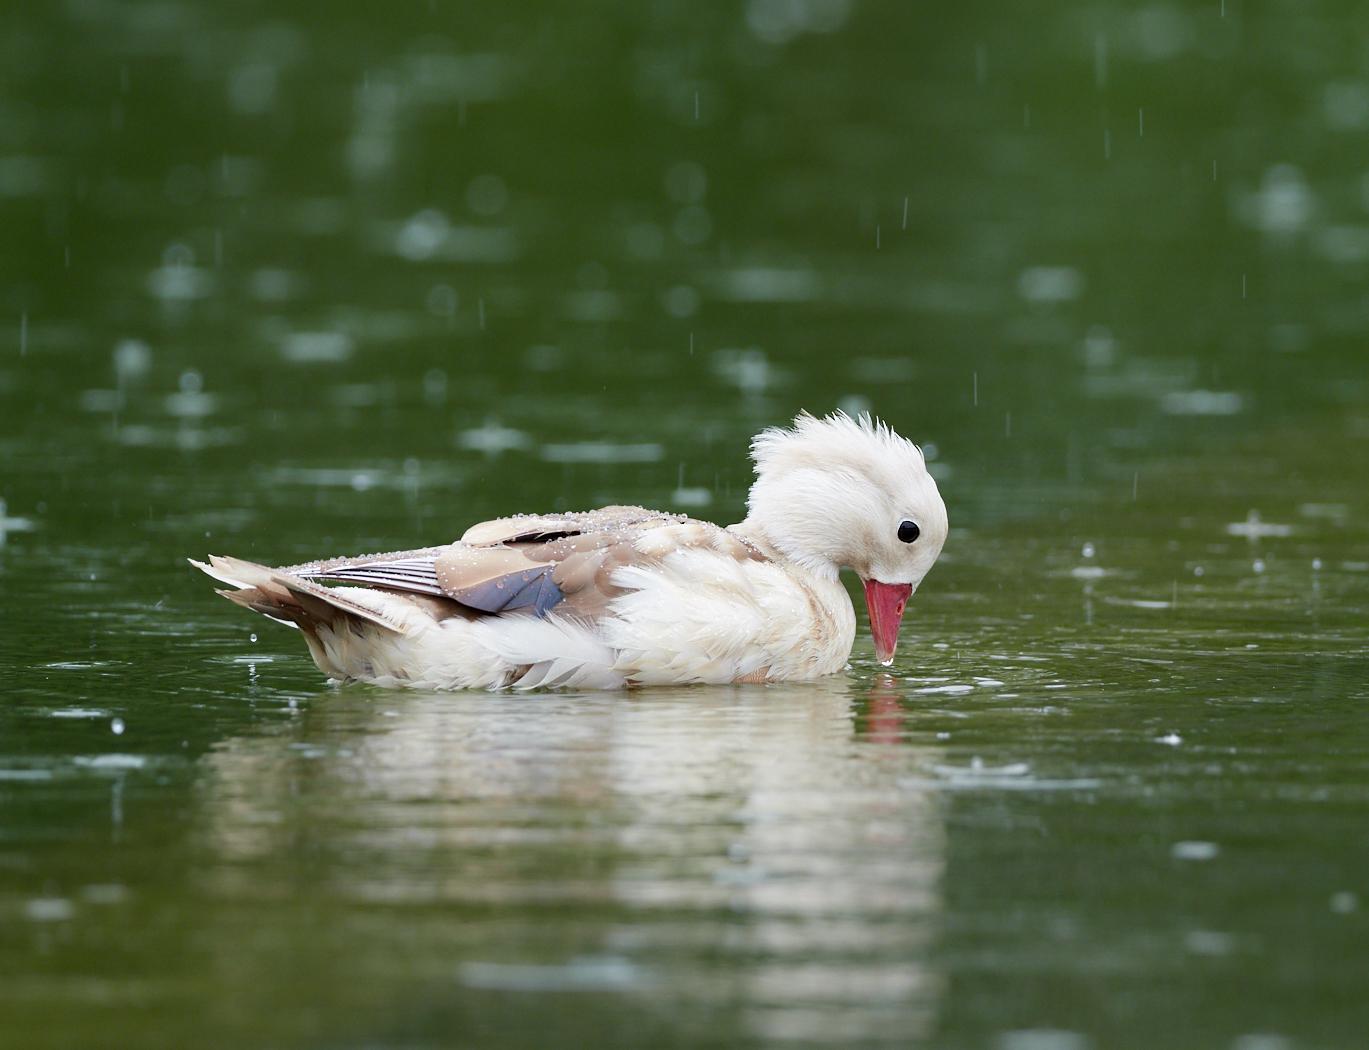 Duck2 in the rain1400x1050 sRGB.jpg